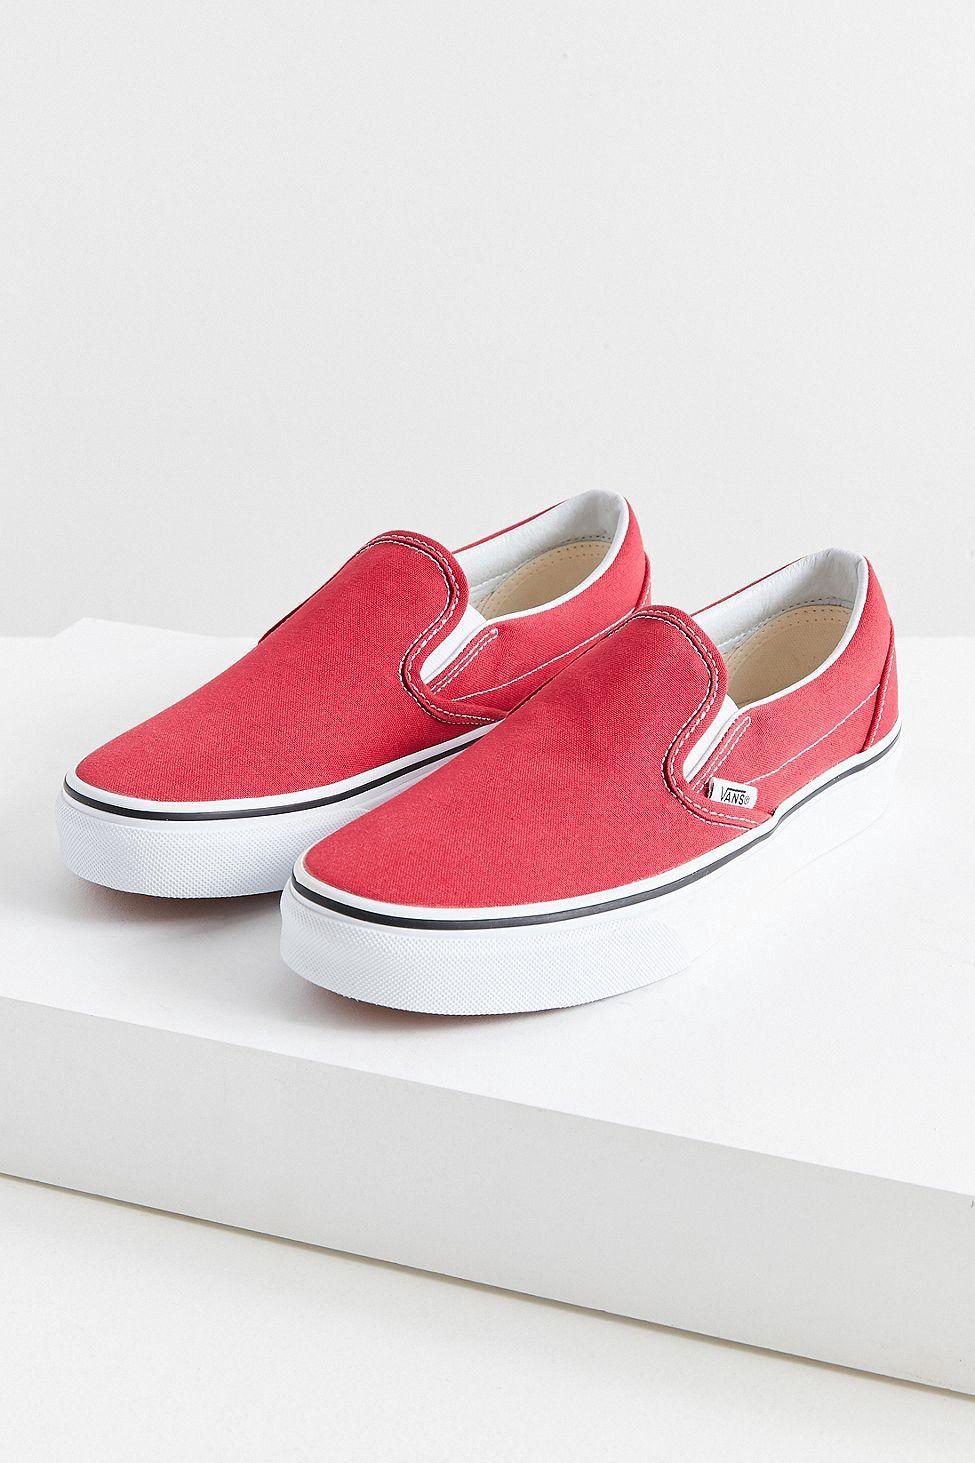 3f01e36a88 Urban Outfitters Vans Classic Canvas Slip-On Sneaker - Crimson W 8 M 6.5